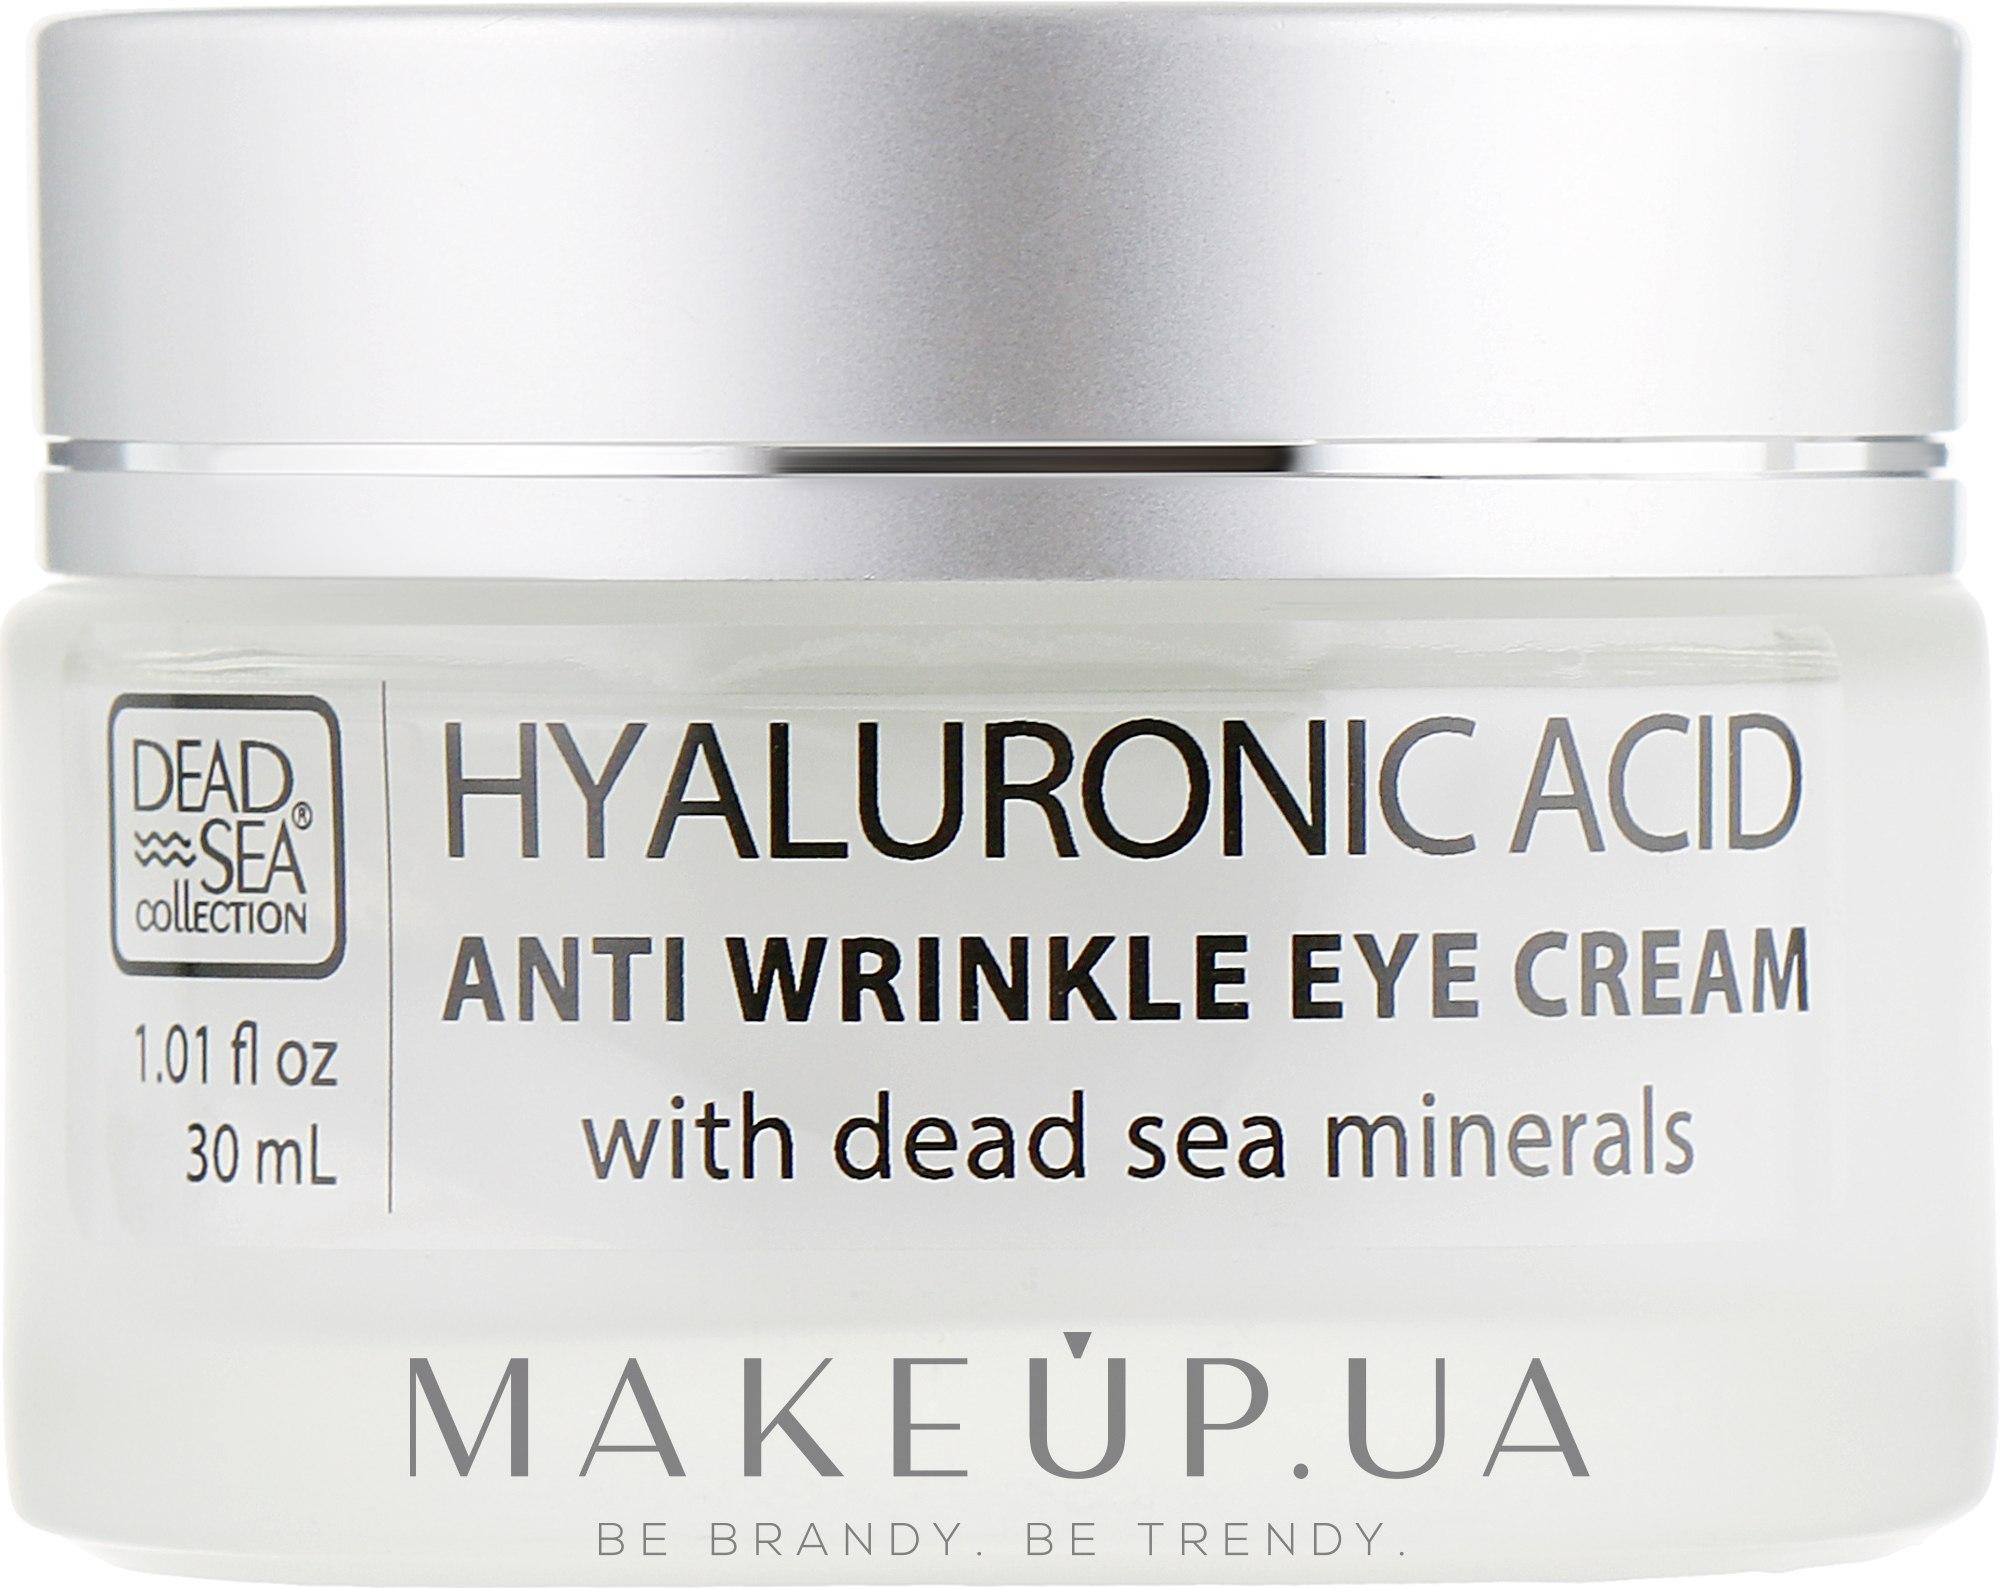 Крем против морщин для кожи вокруг глаз - Dead Sea Collection Hyaluronic Acid Eye Cream — фото 30ml